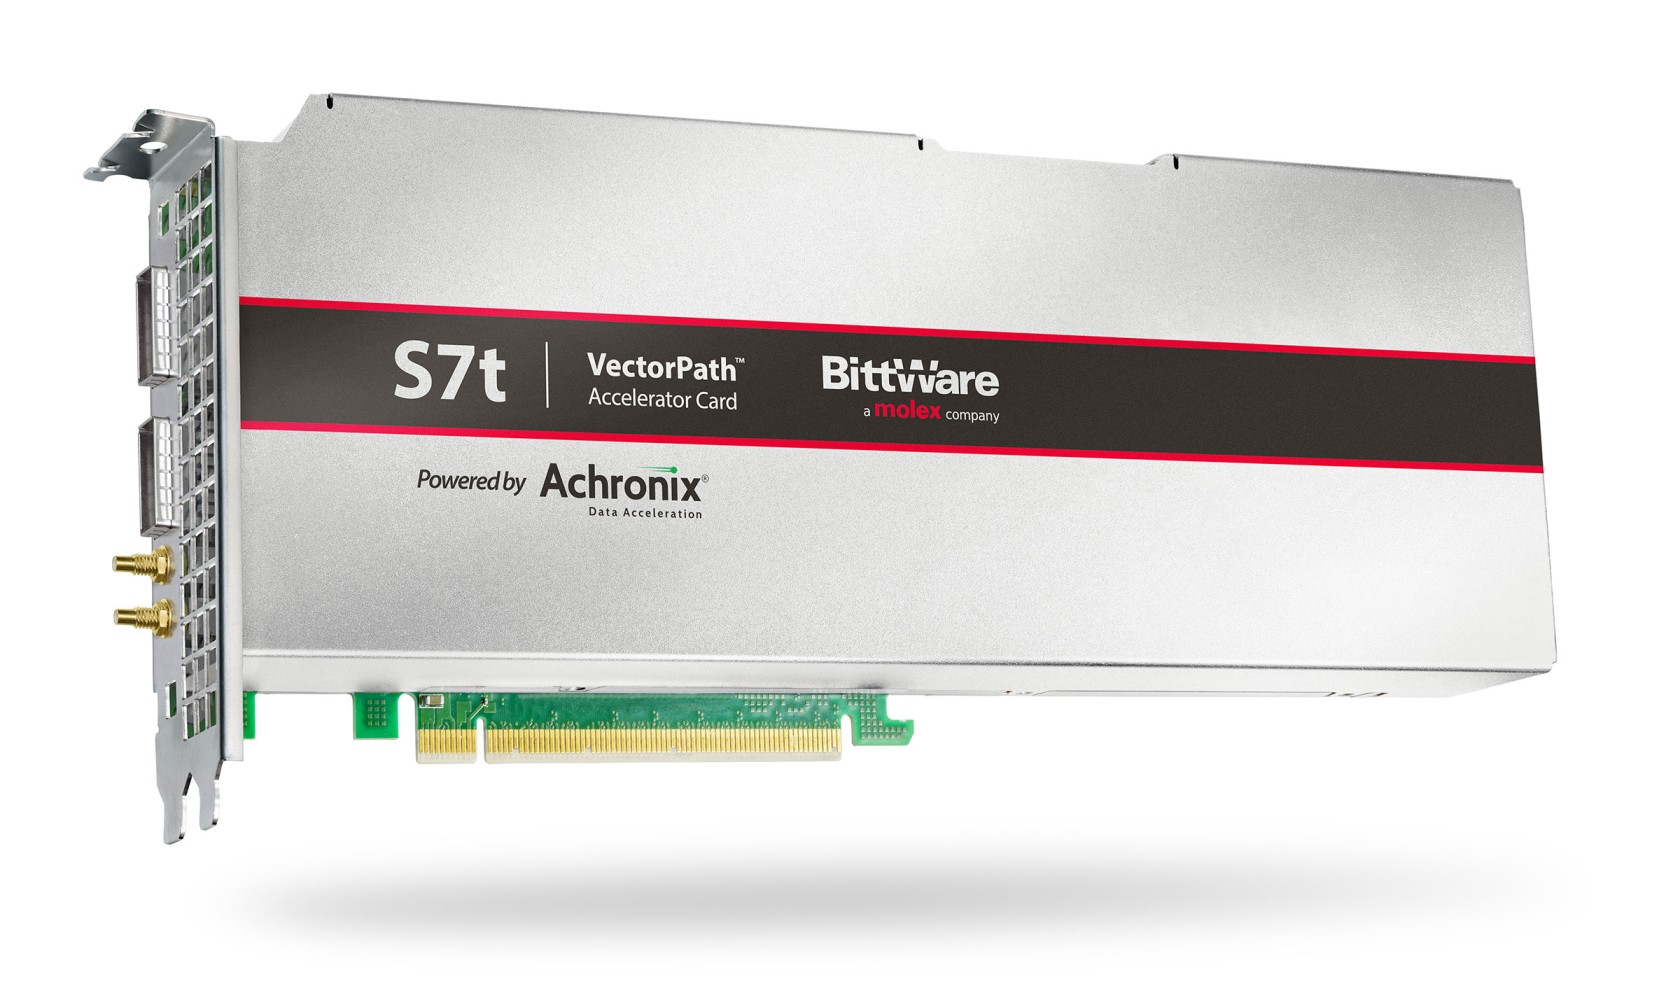 BittWare 和 Achronix 宣布达成战略协作并推出采用 7 纳米 Speedster7t FPGA 的企业级 PCIe 加速卡产品